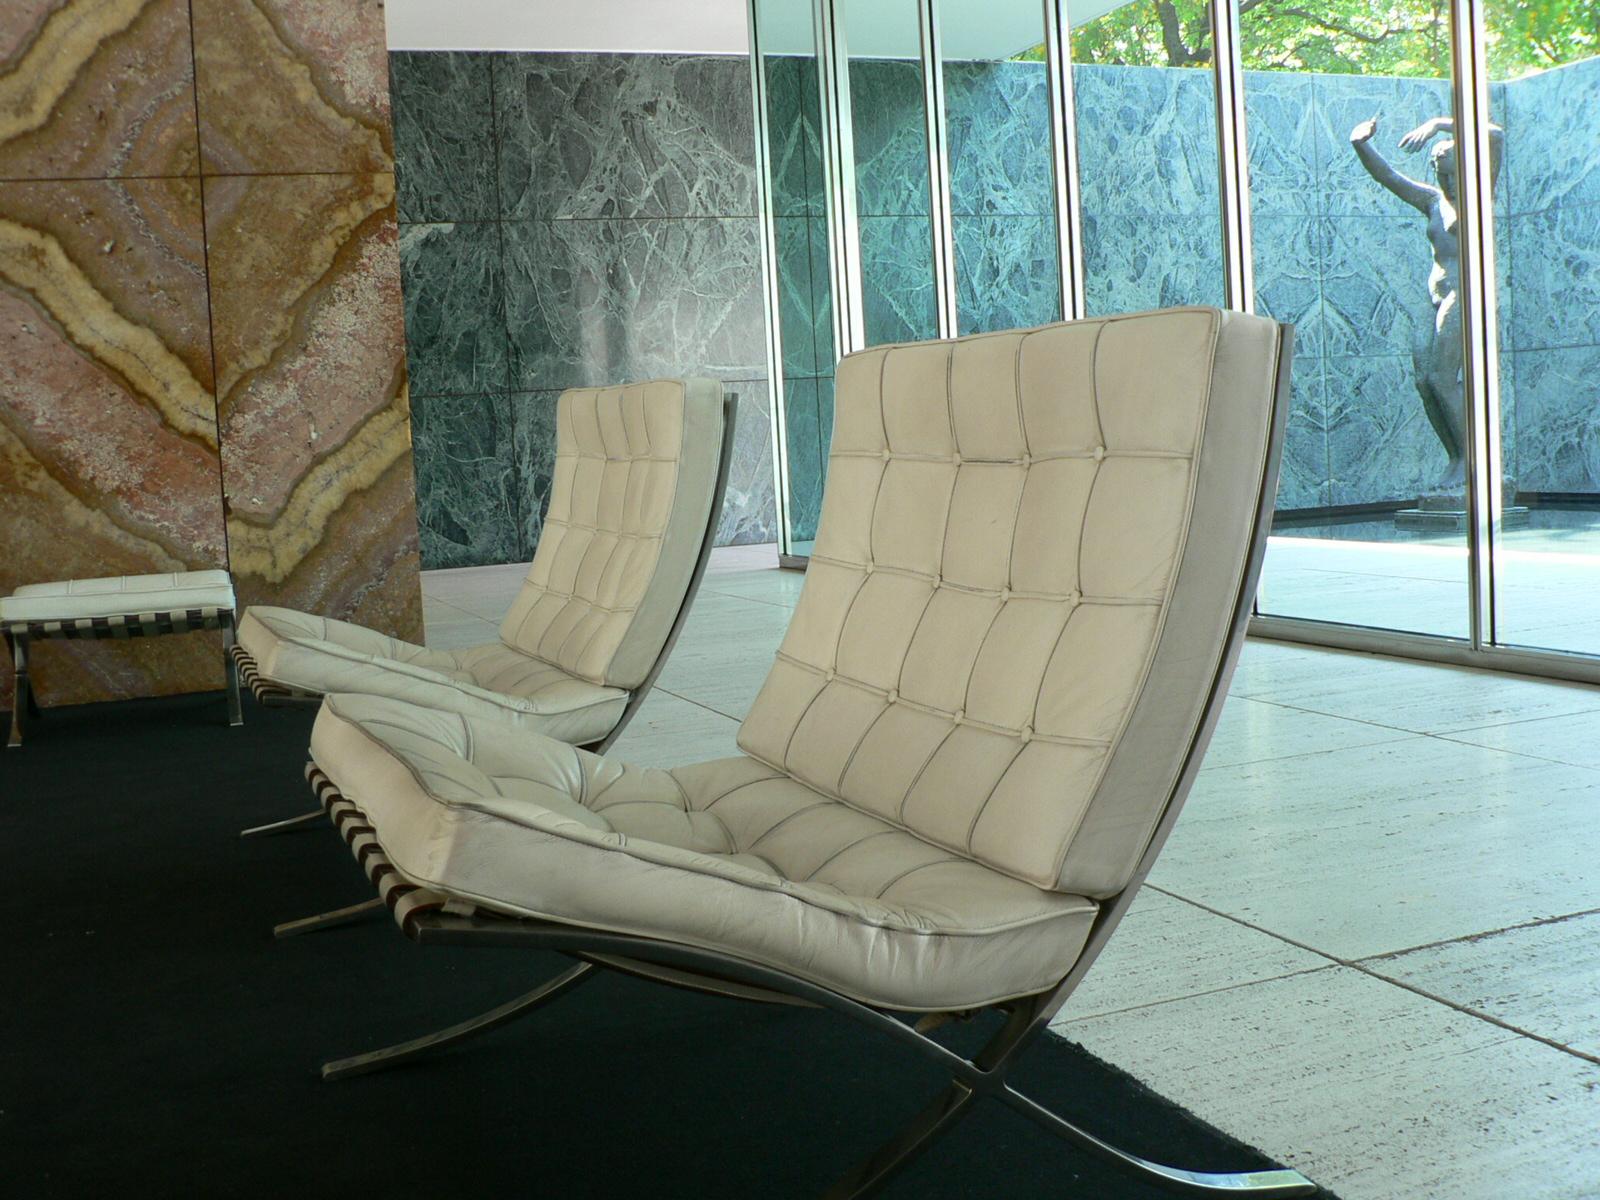 Muebles diferentes para gente creativa yorokobu for Silla barcelona imitacion